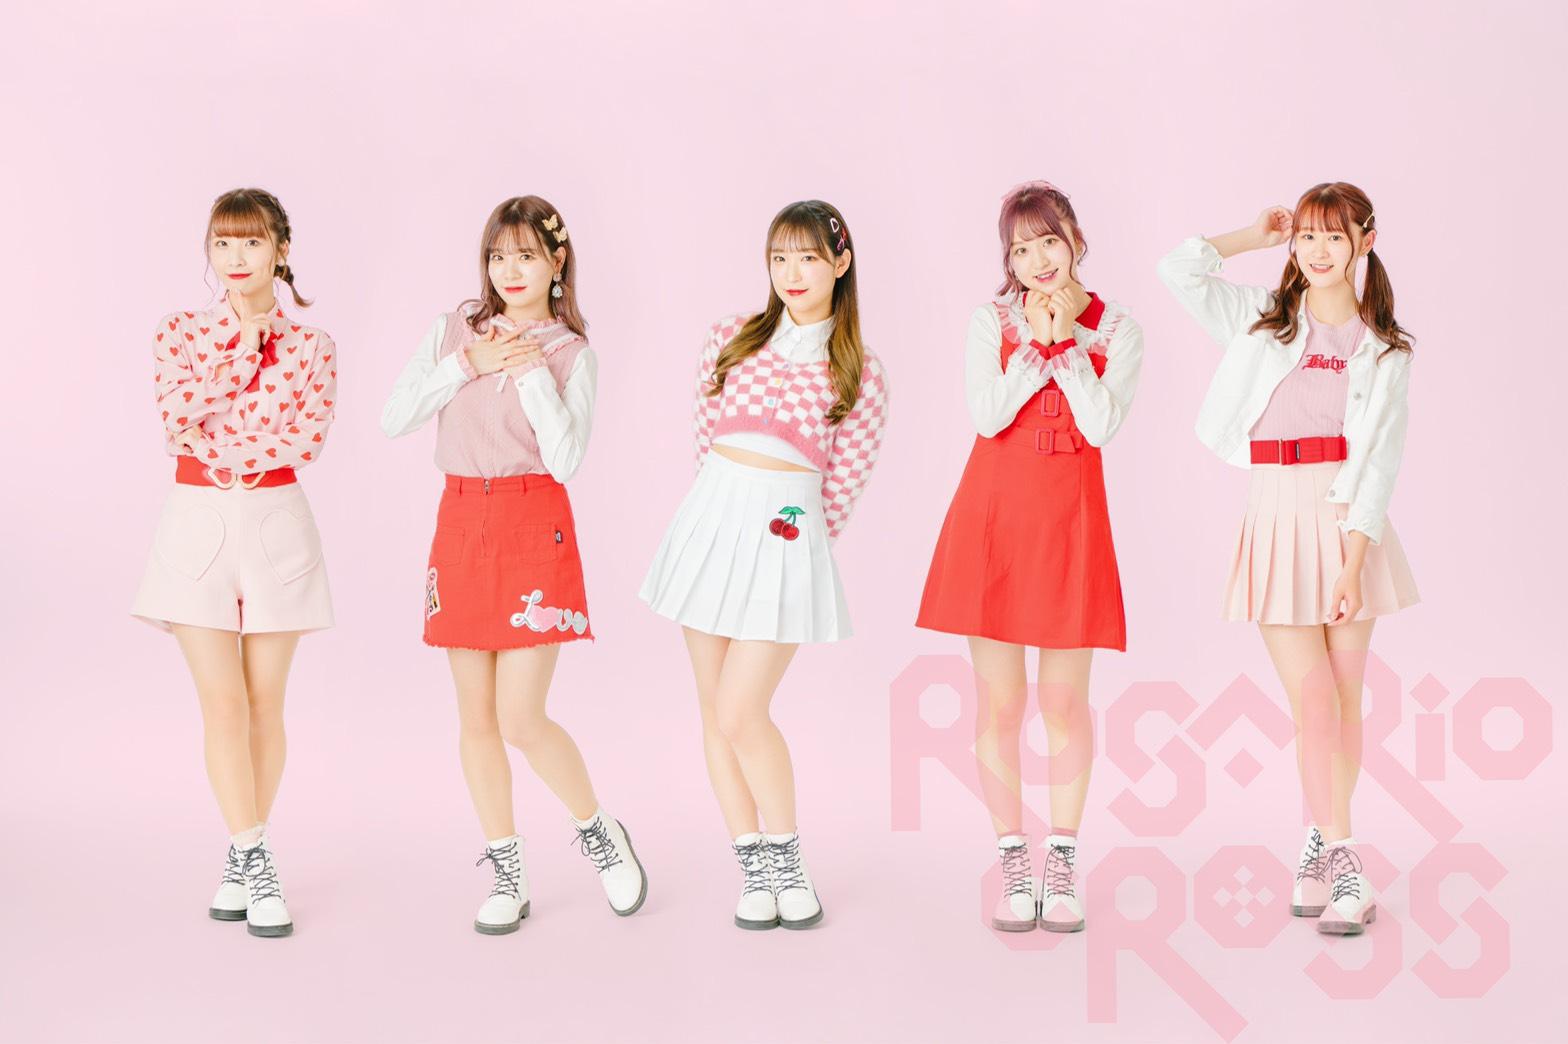 TOKAIグループ Presents ROSARIO+CROSS定期公演  「shout!shout!shout!vol.12」昼公演のみ